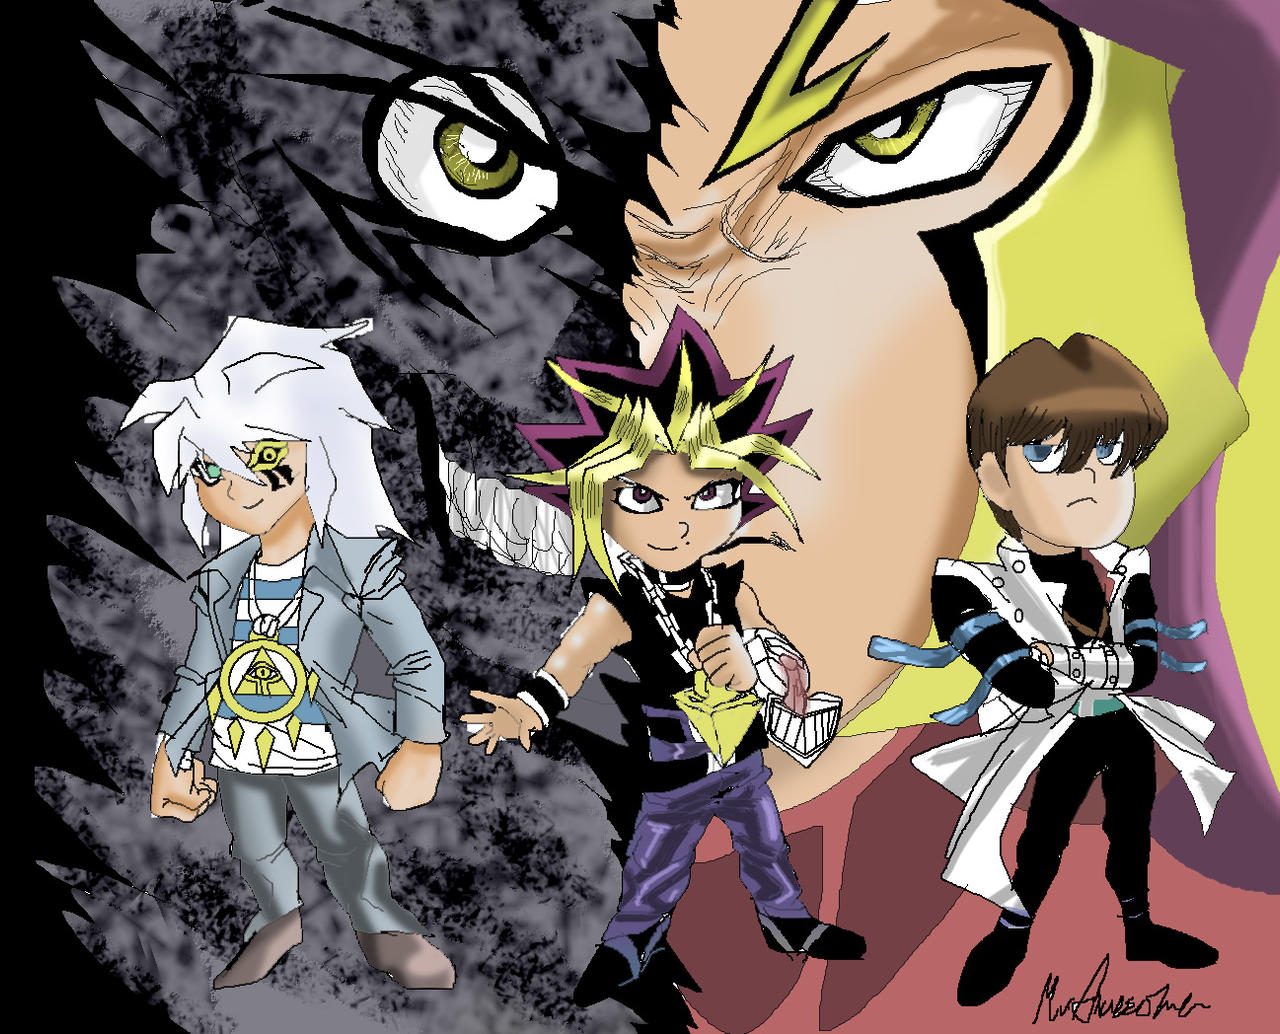 Yu-Gi-Oh! bonds beyond time II Chapter 4 Go_read_bonds_beyond_time_2_manga__links_below__by_mrawesome45-d75x9kv